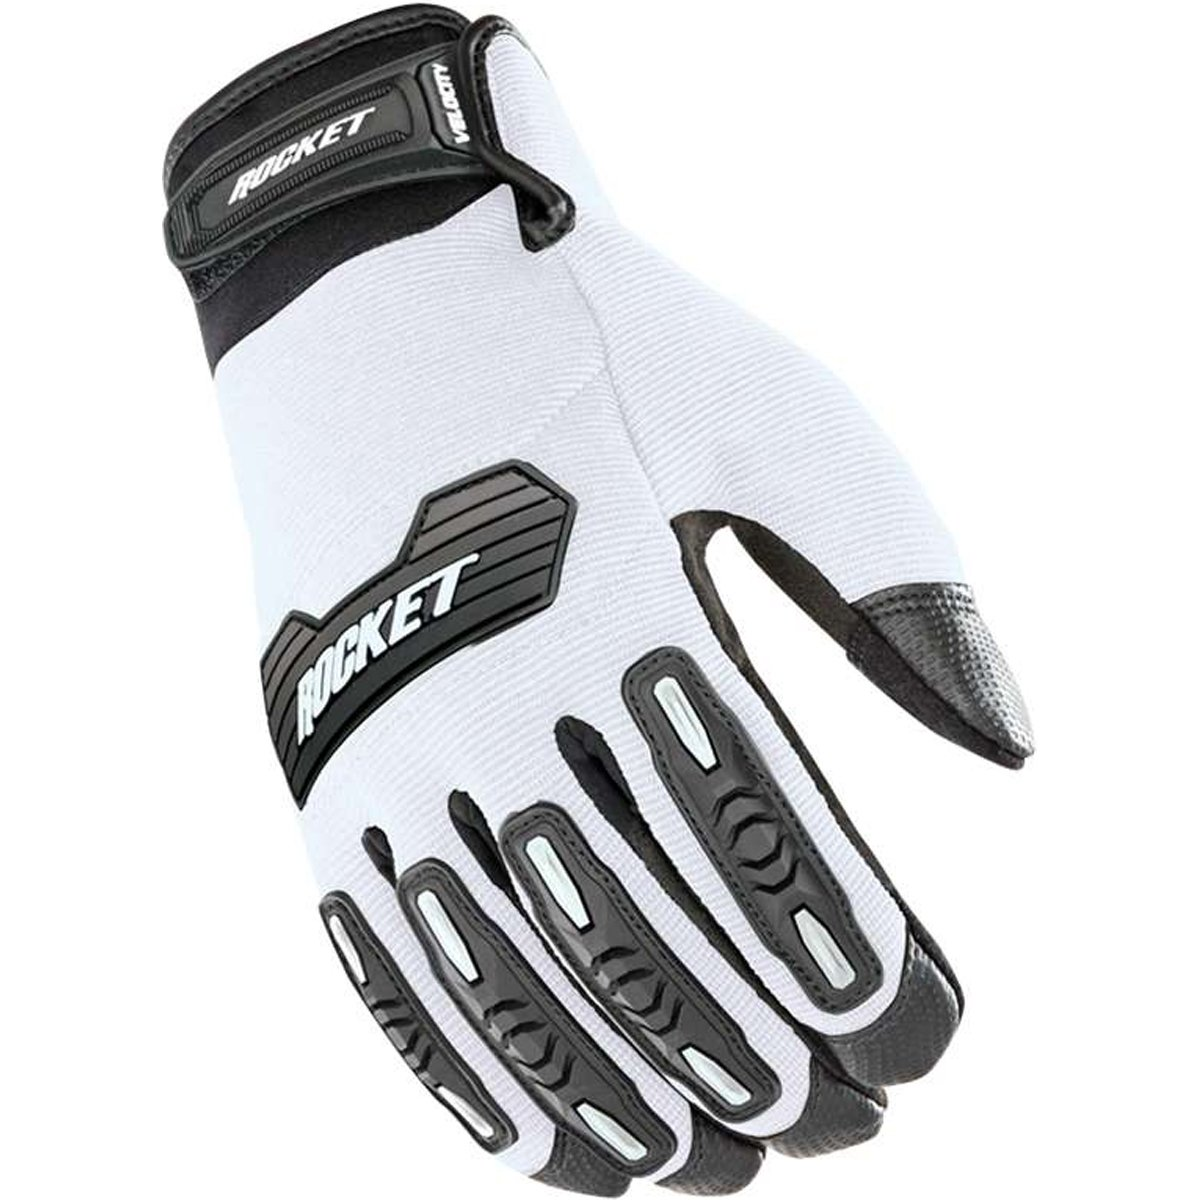 Joe Rocket Velocity 2.0 Men's Textile Street Motorcycle Gloves - White/Black / Large by Joe Rocket